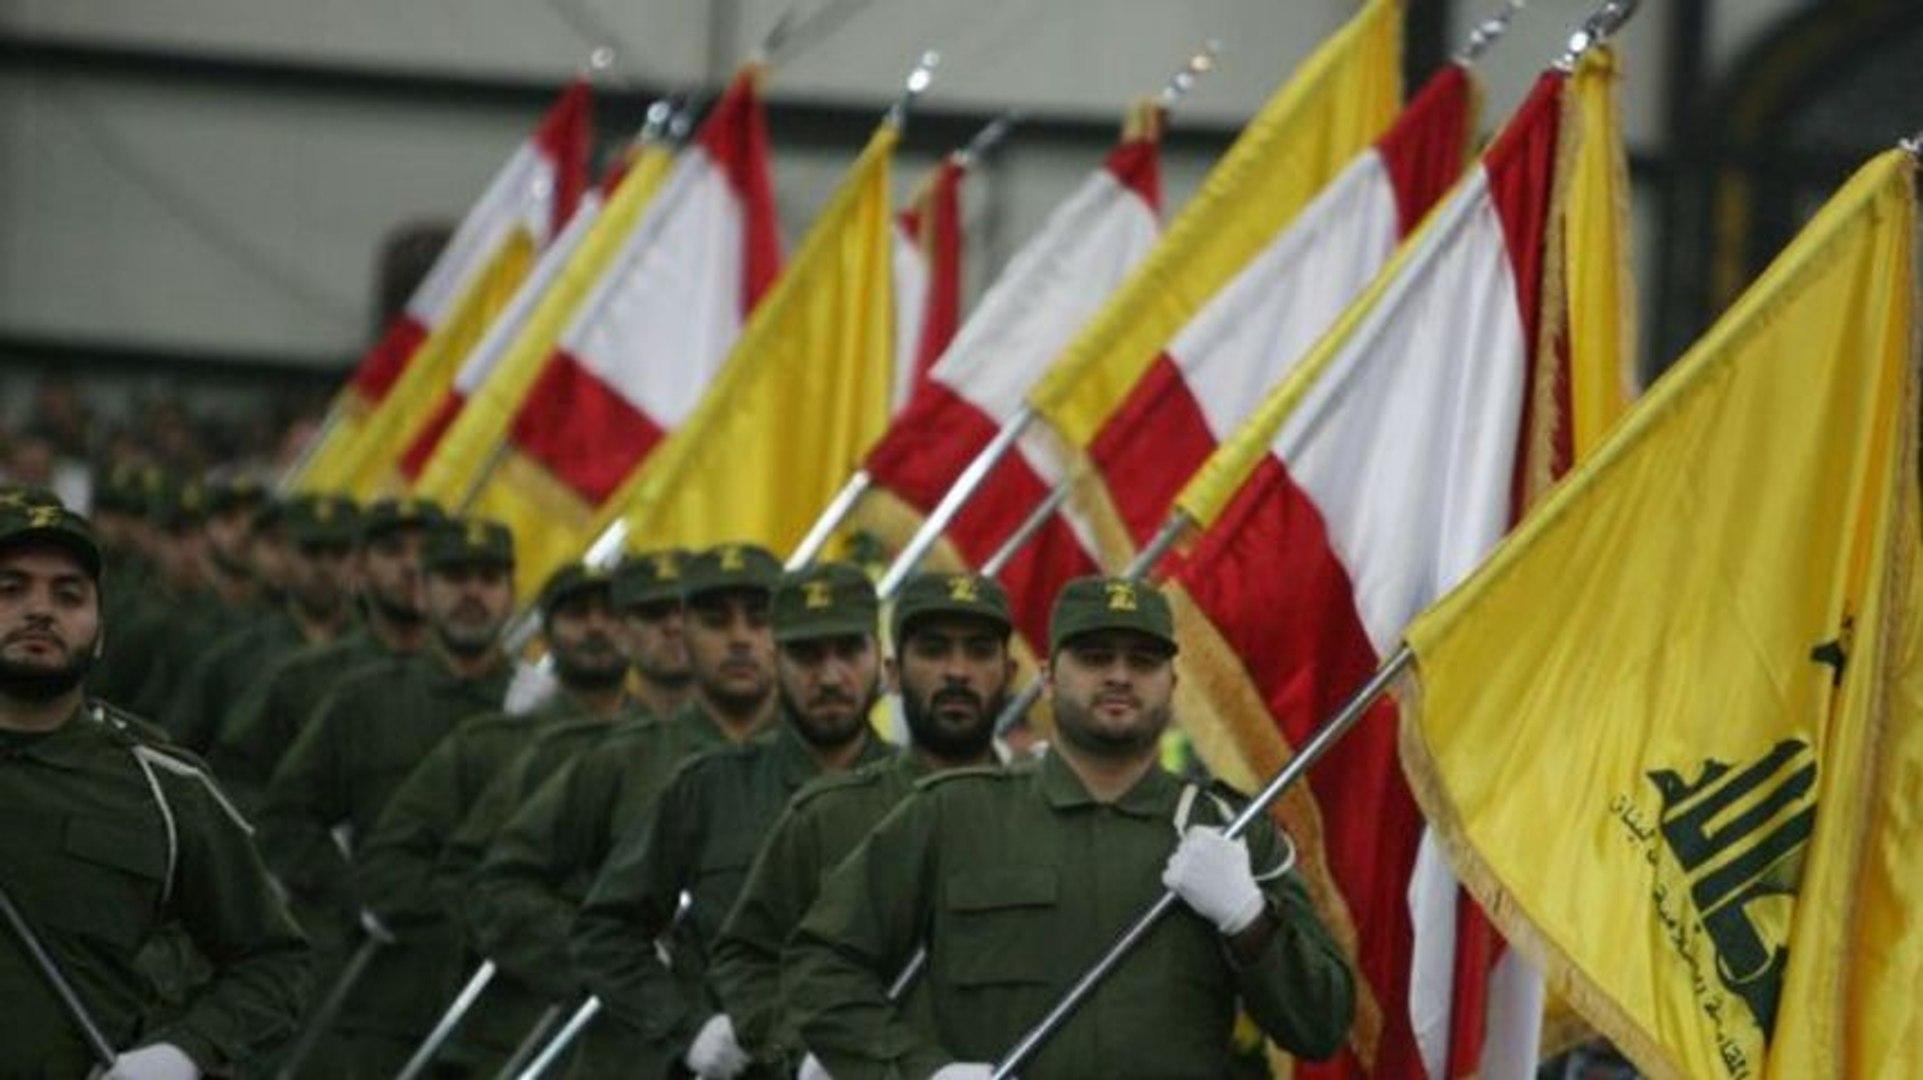 Europe's blacklisting of Hezbollah